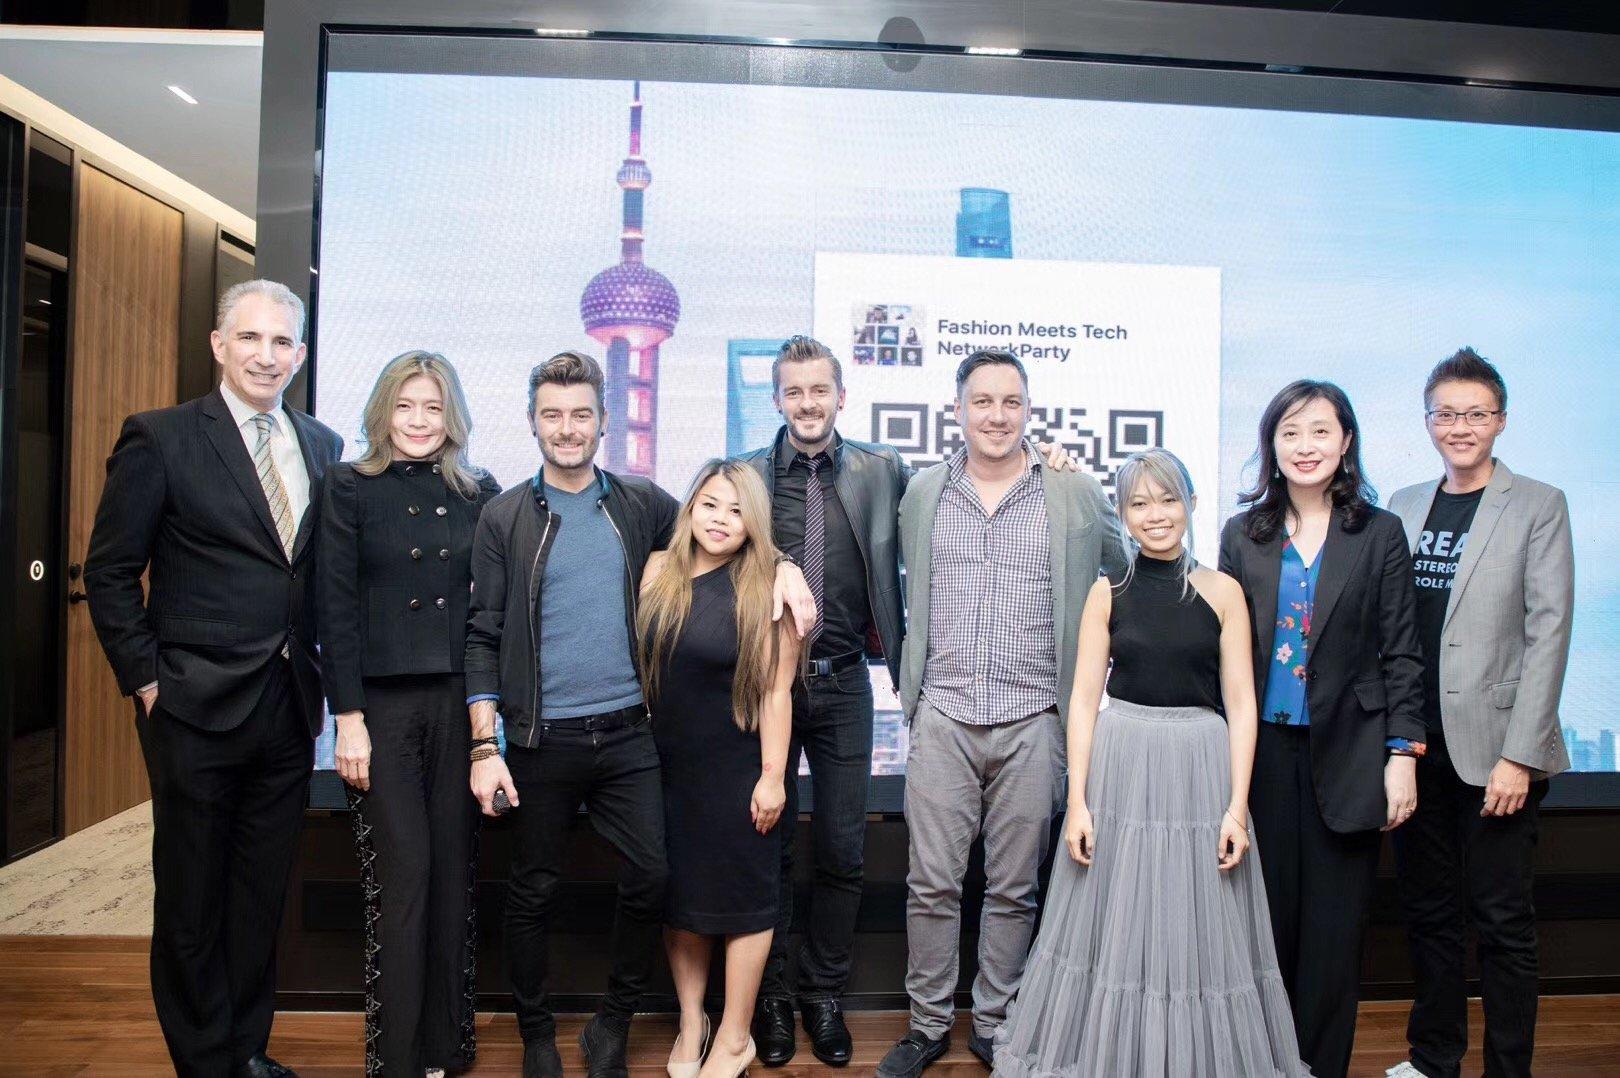 Fashion Meets Tech Networking Party: A Recap